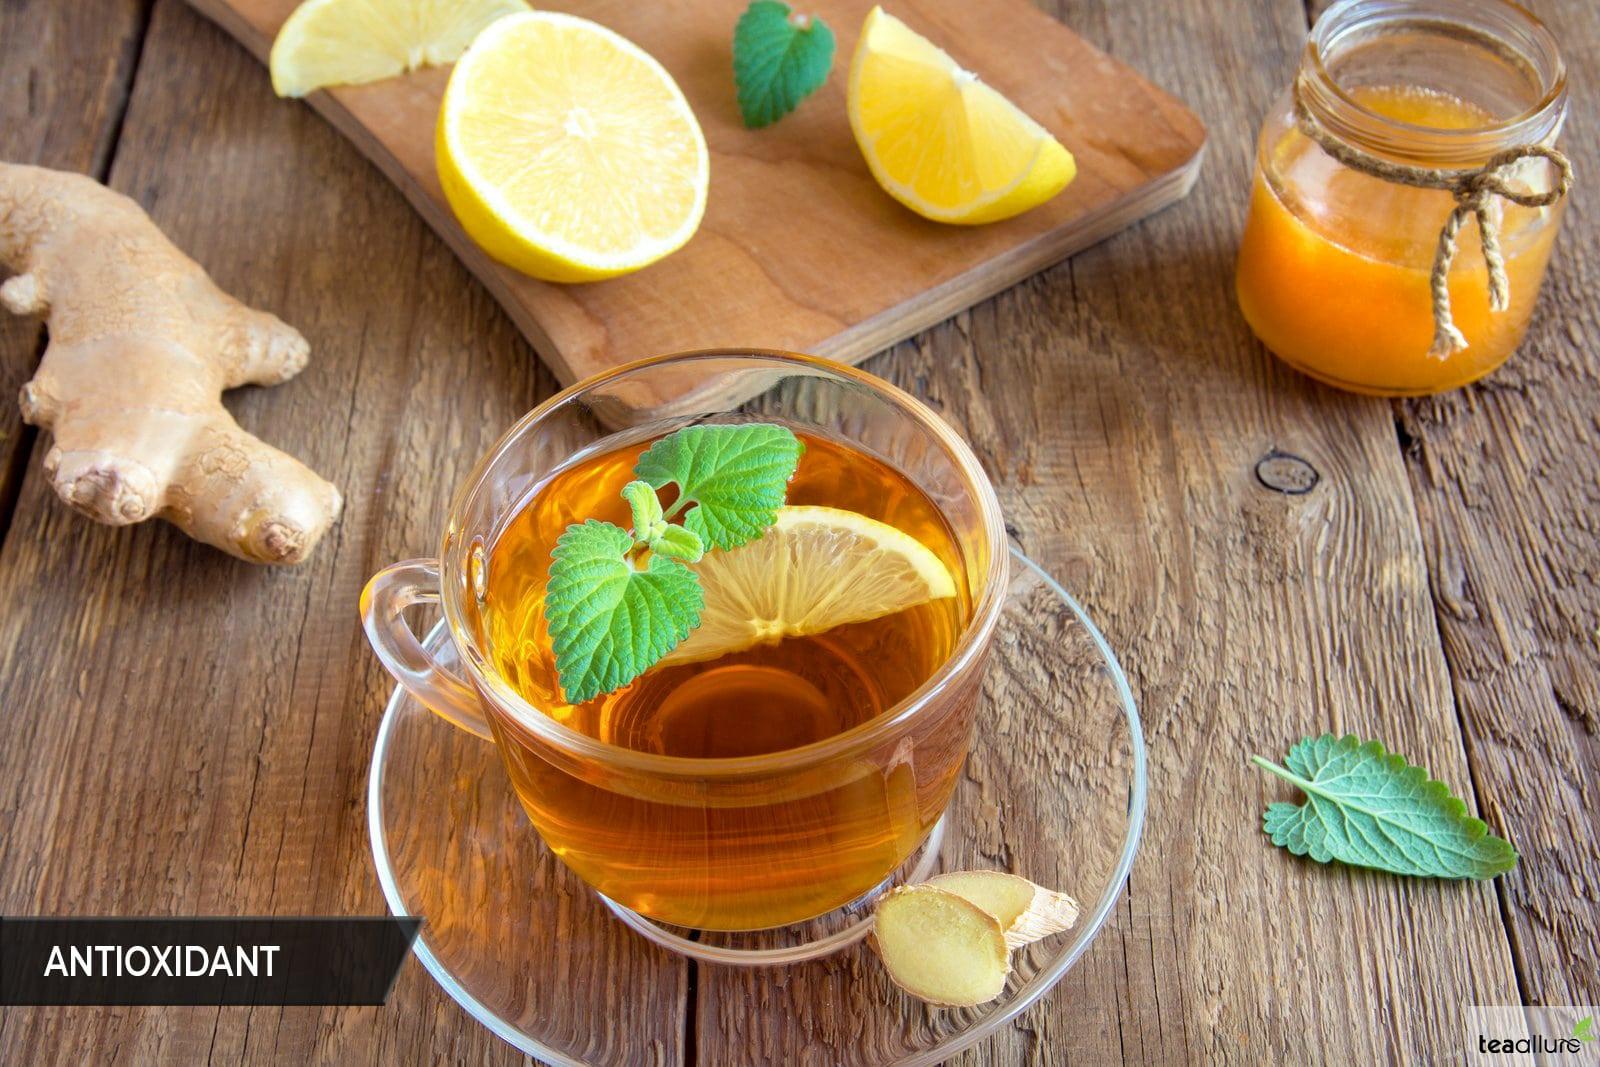 Black tea as antioxidant